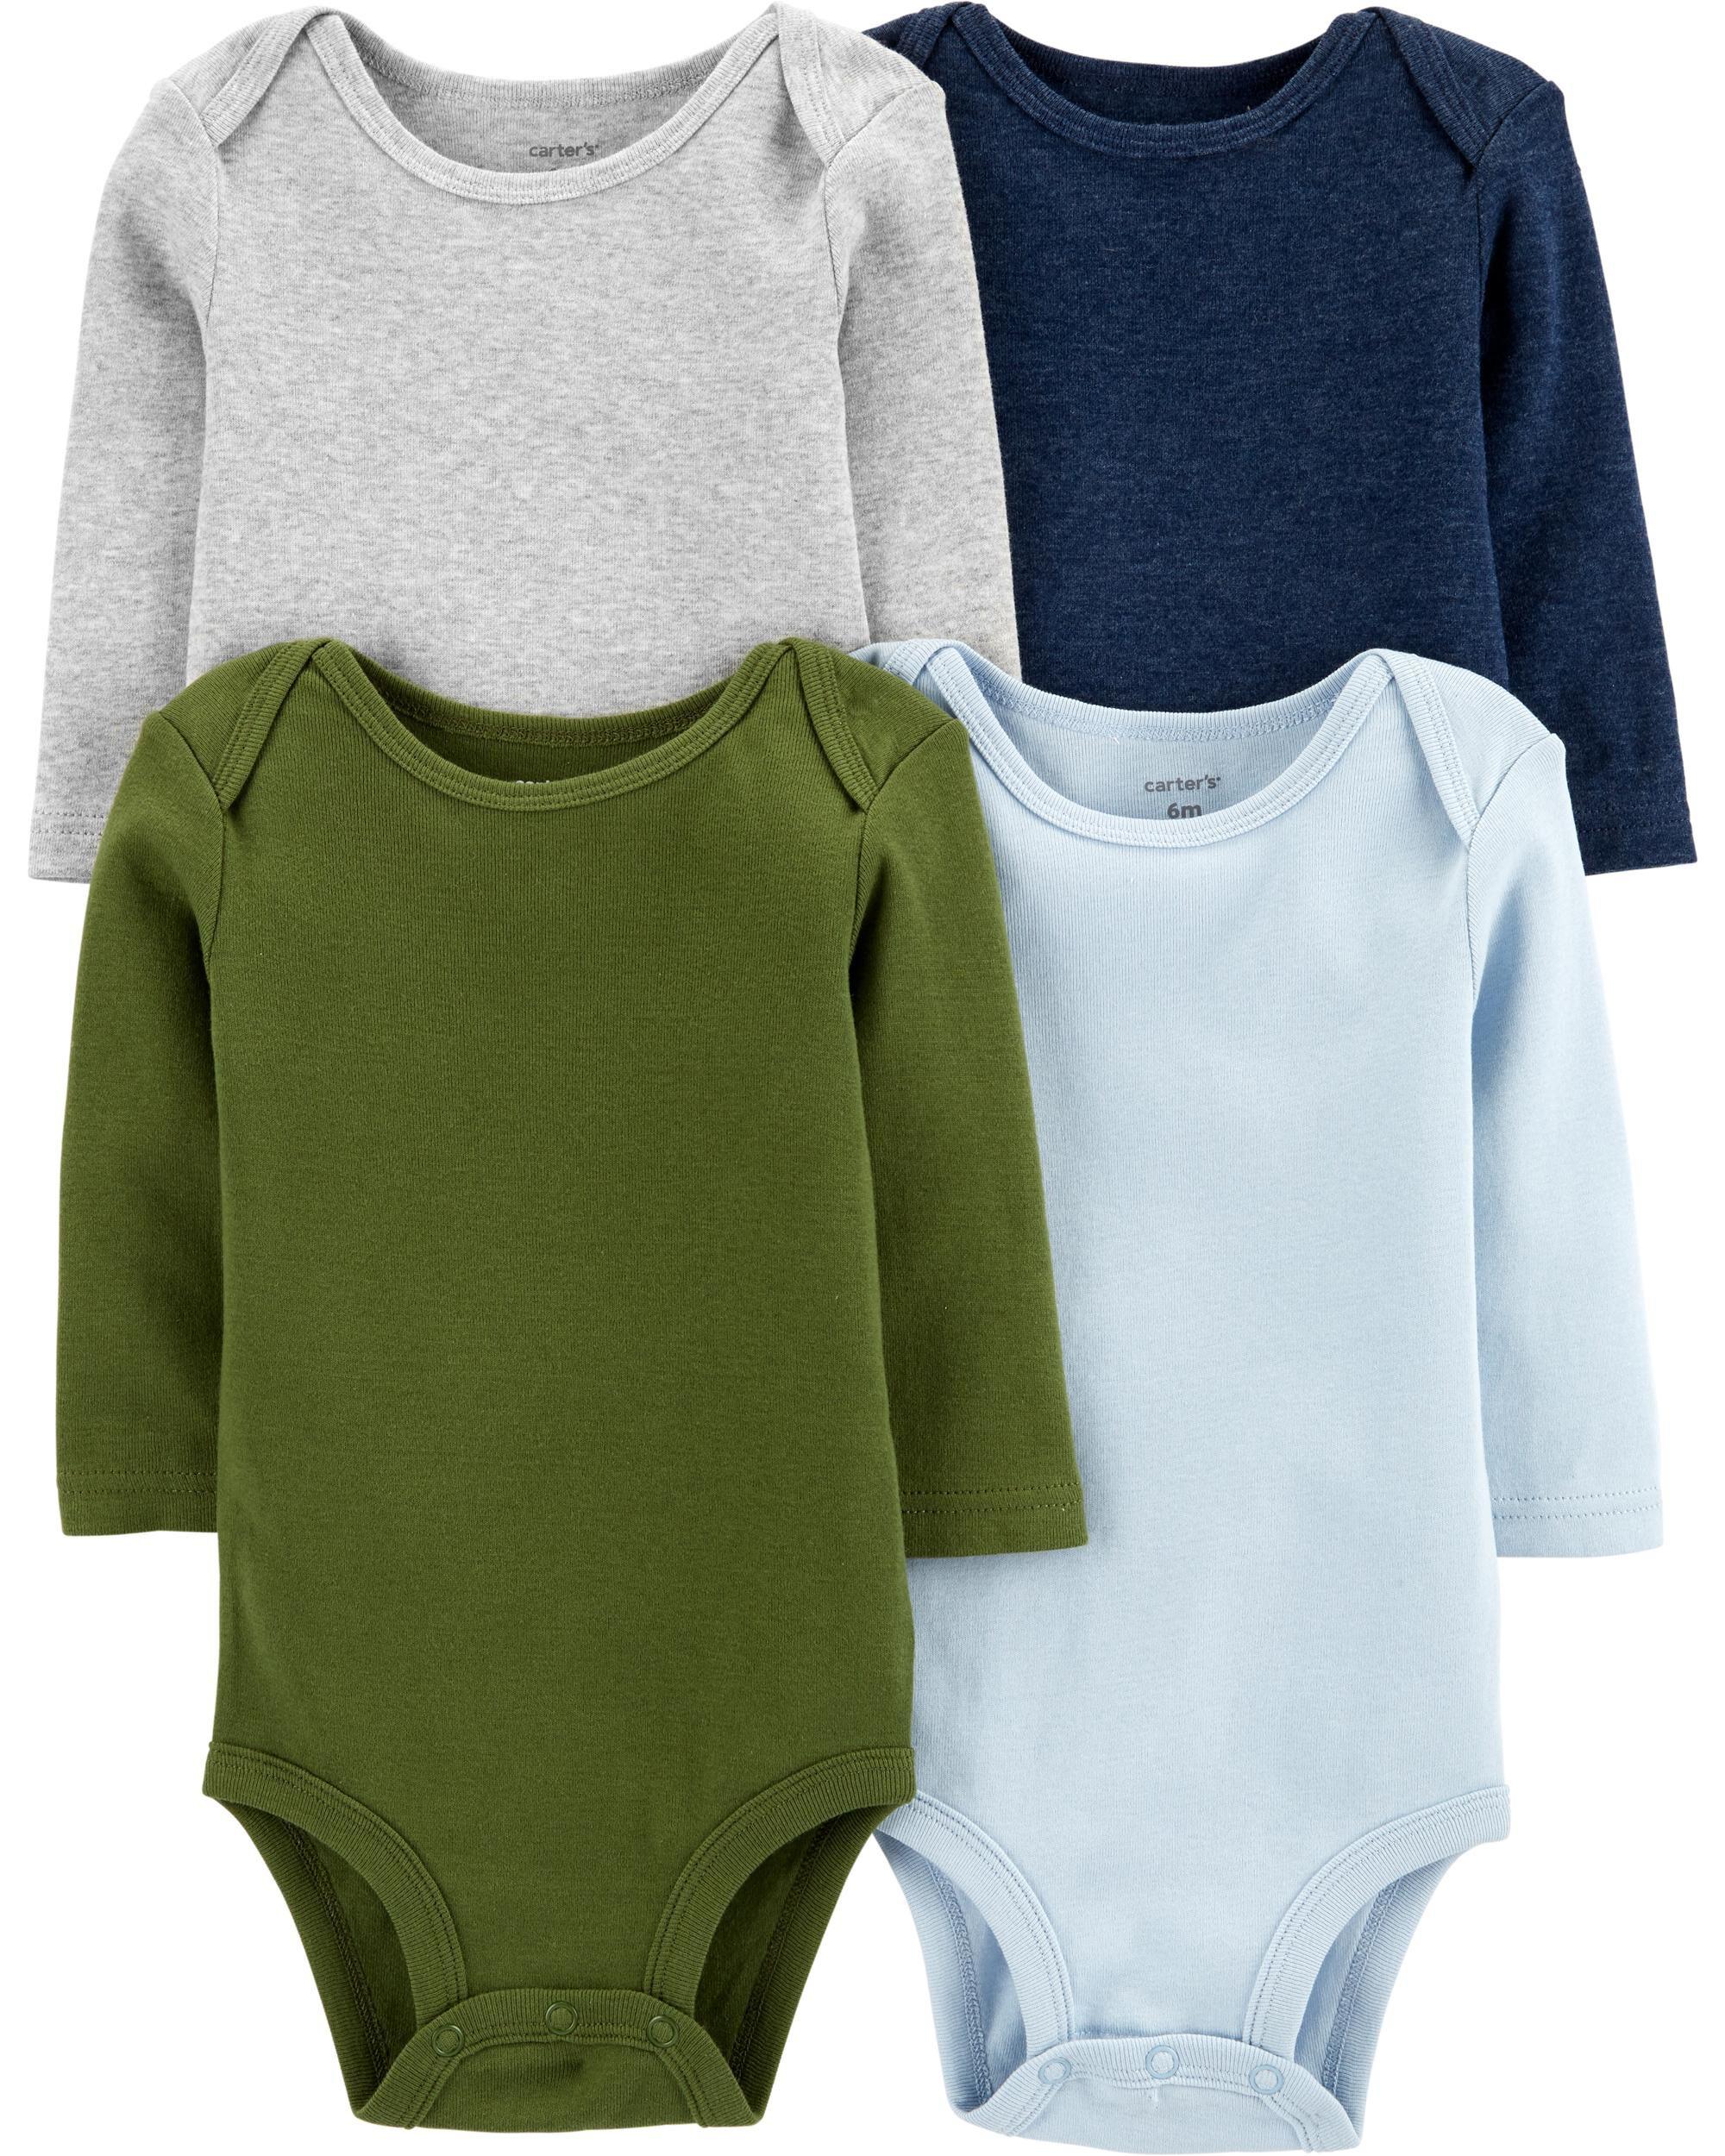 *DOORBUSTER* 4-Pack Long-Sleeve Original Bodysuits